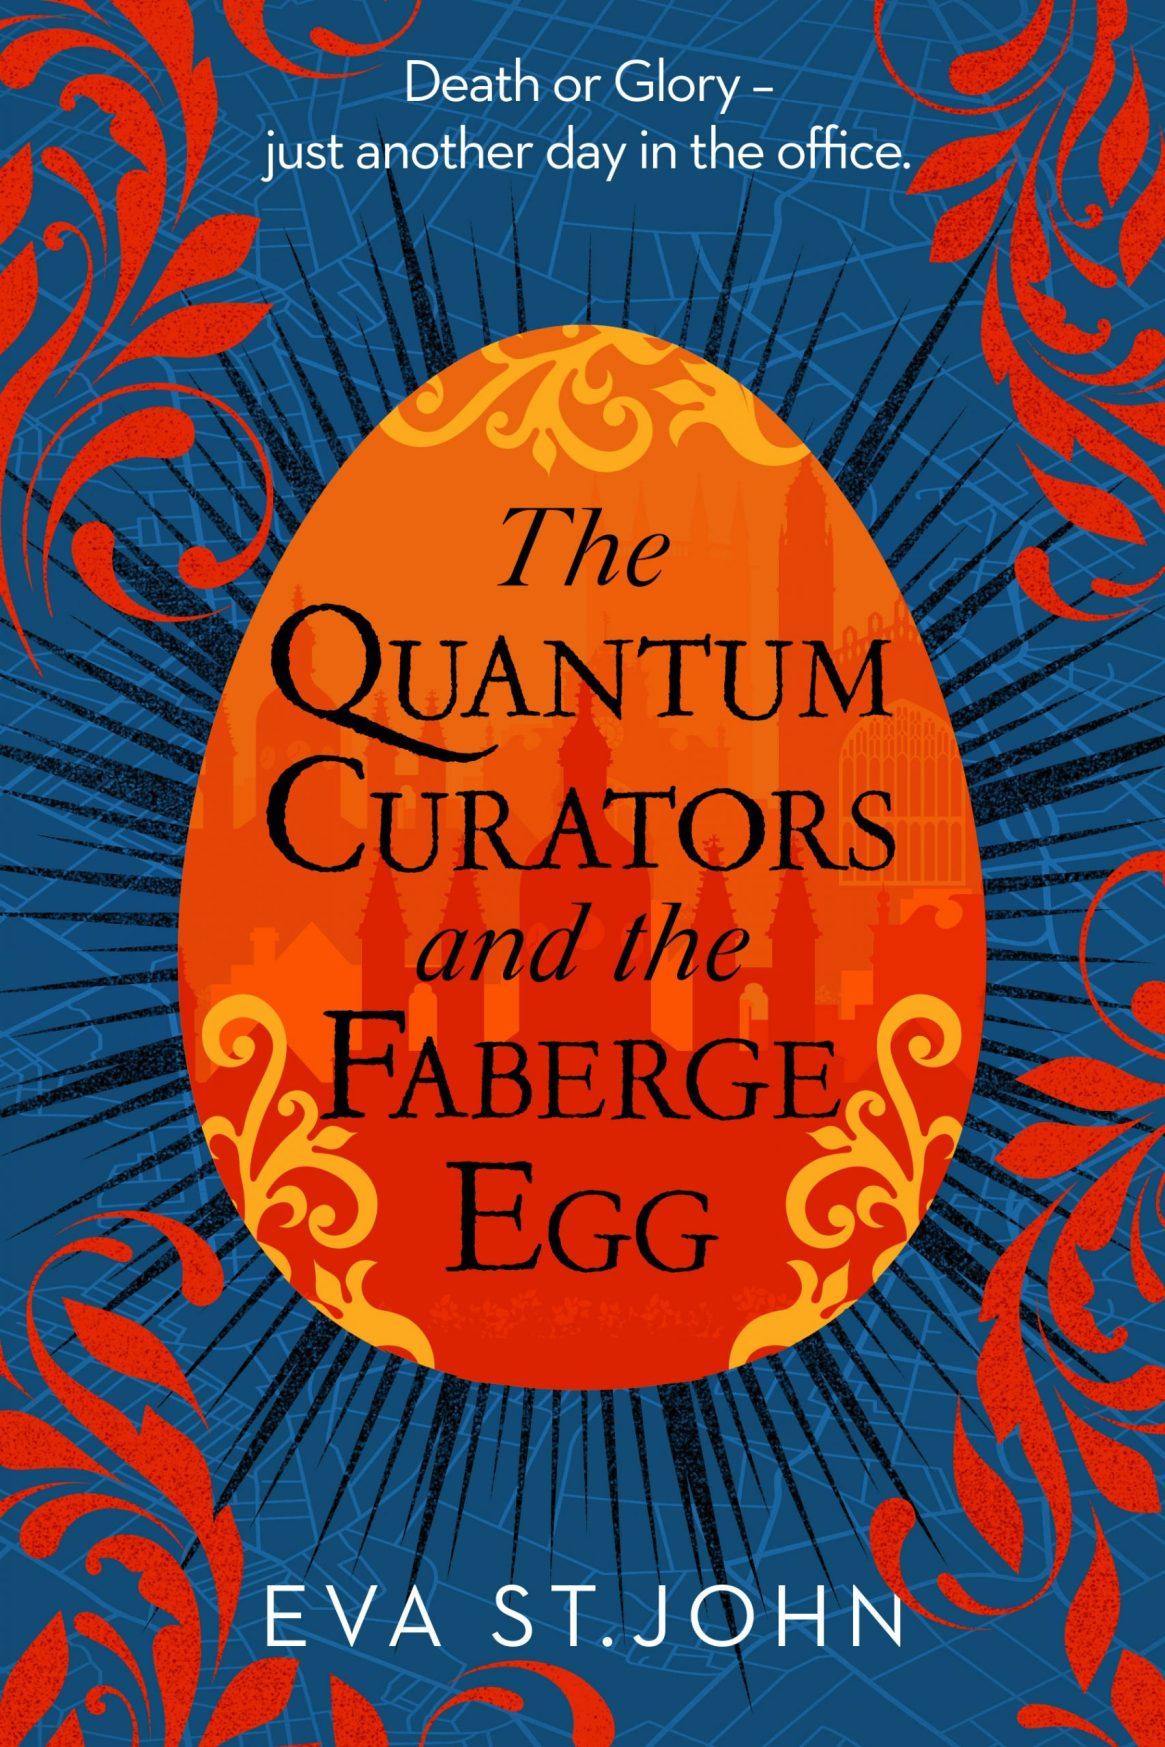 Hurley_QuantumCuratorsFabergeEgg_Ebook (002)